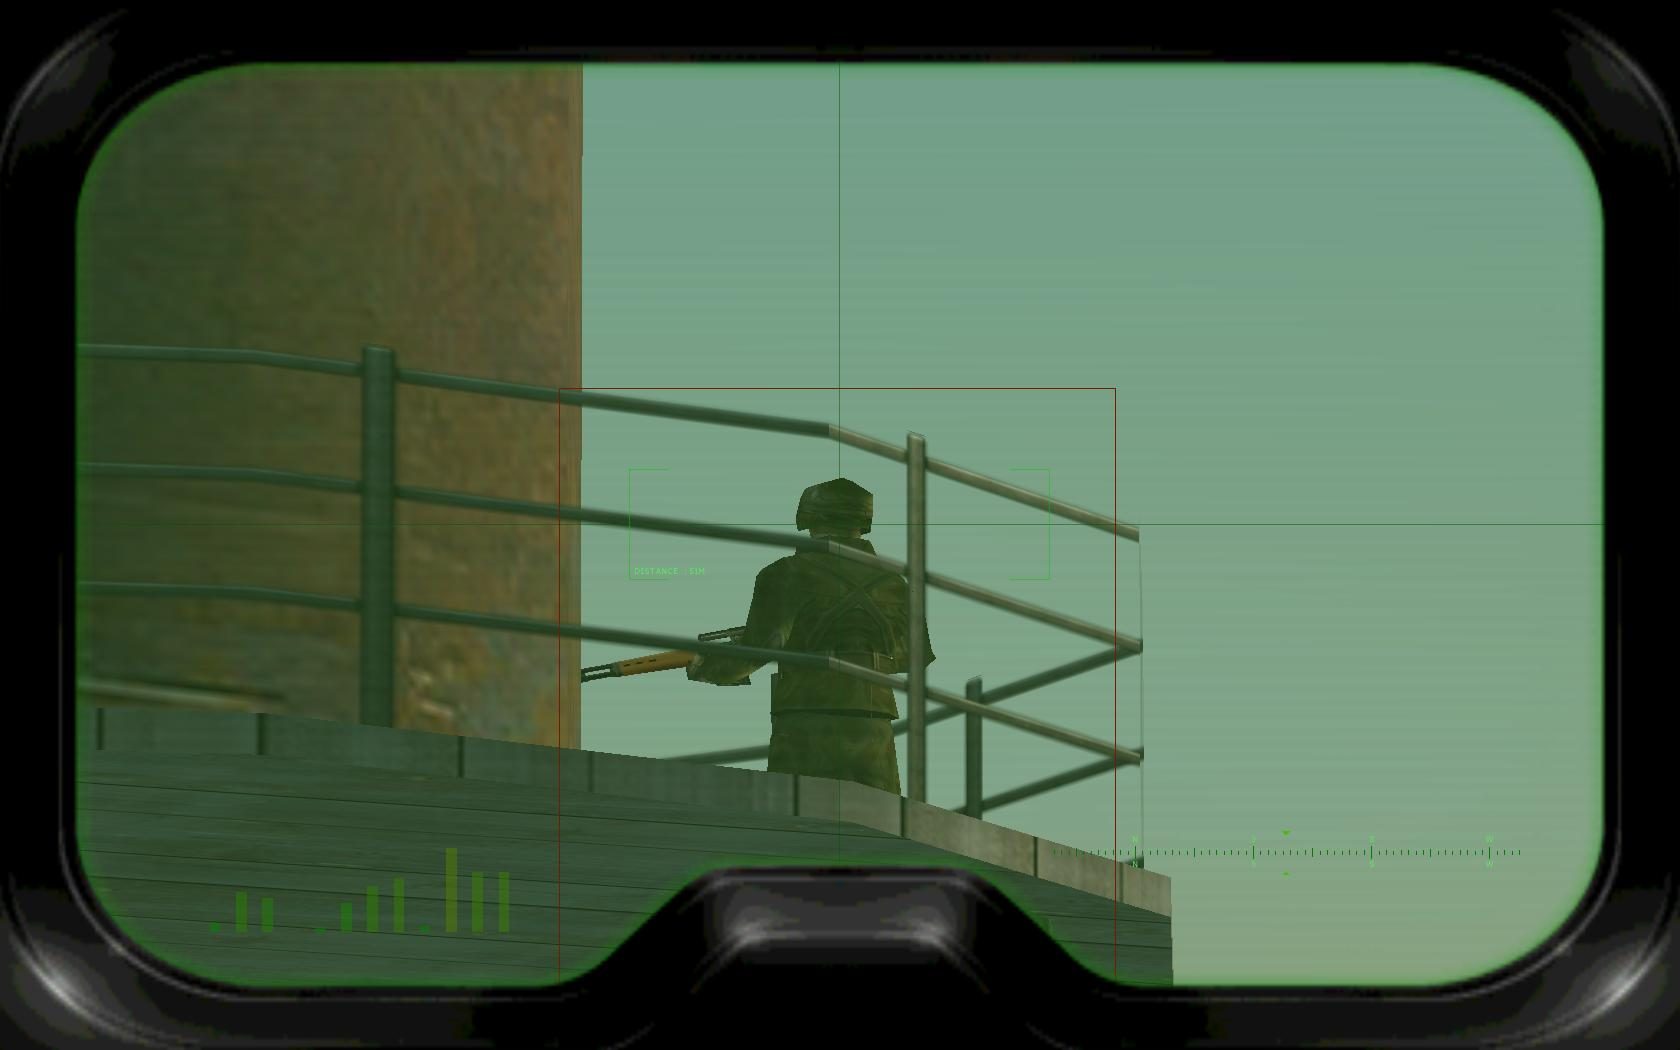 http://megahttp.at.ua/IGI_torrent/IGI_2010-04-29_12-57-22-72.jpg